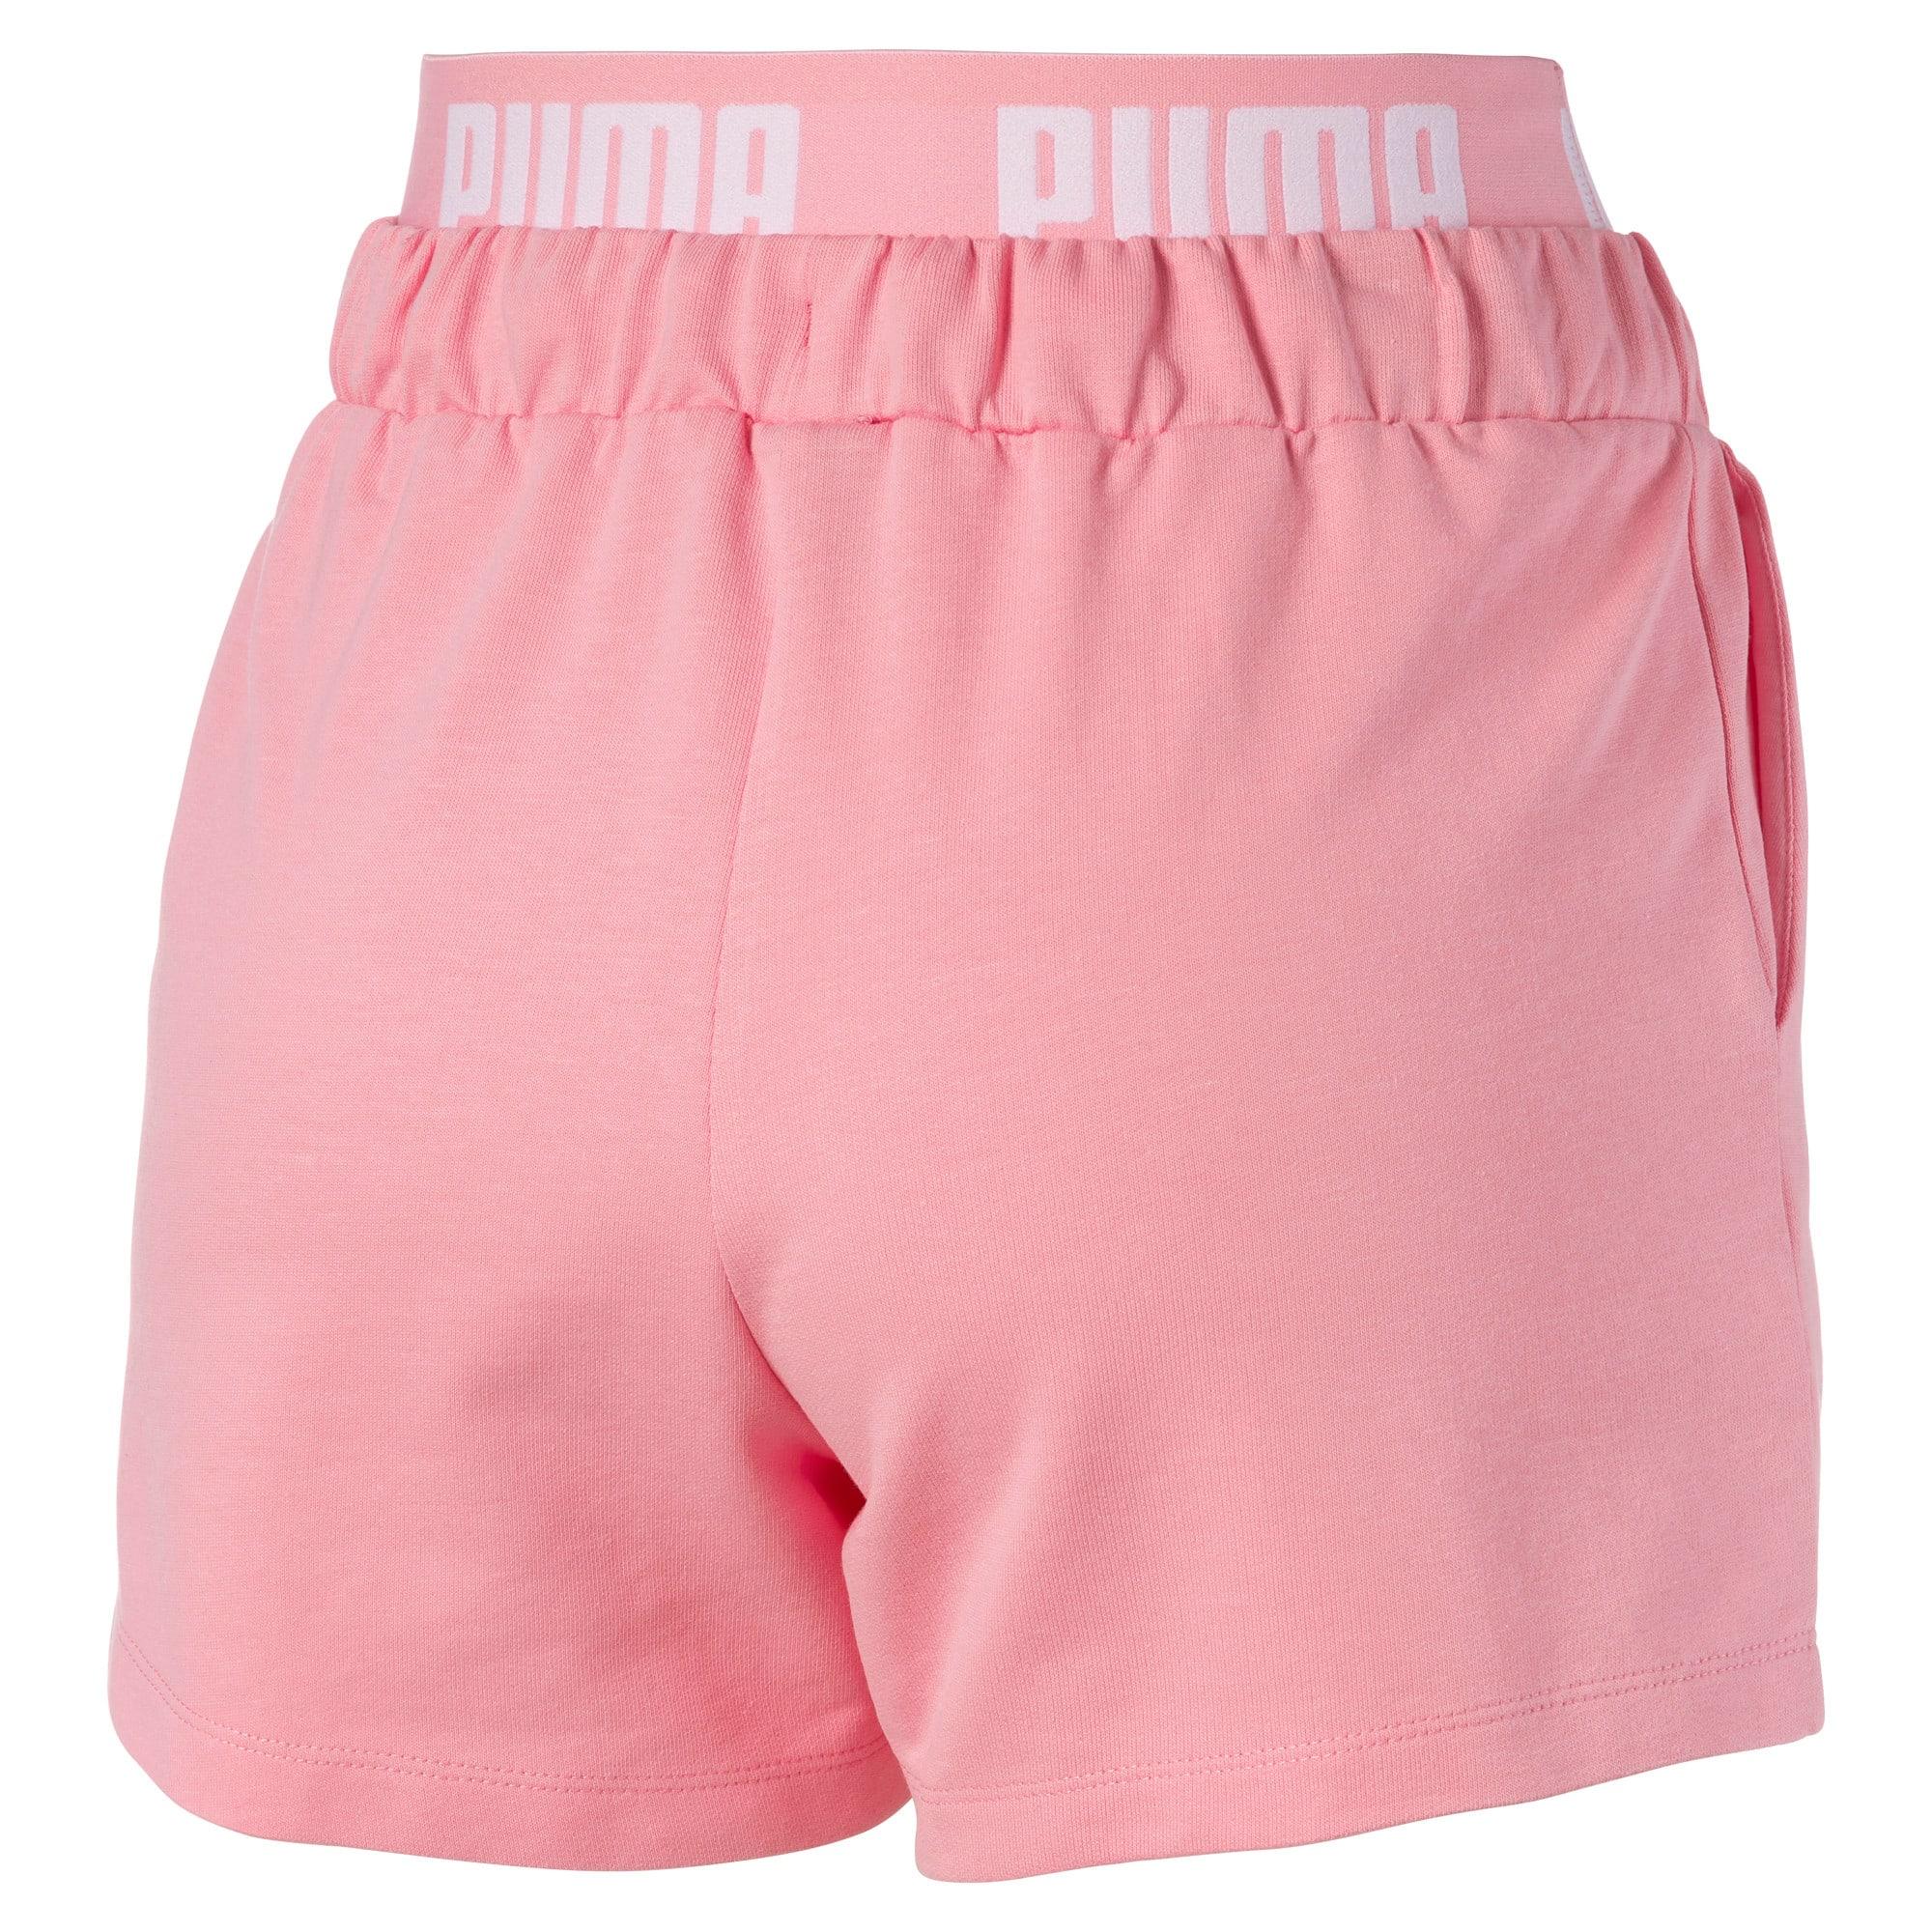 Thumbnail 2 of Women's Shorts, Peony, medium